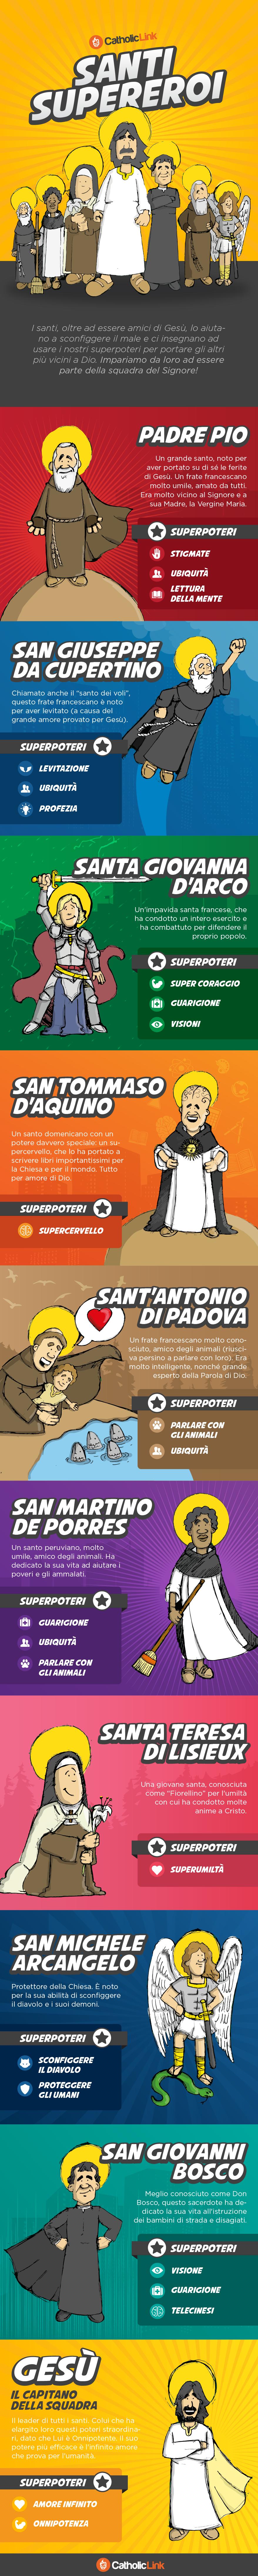 Info Santos Superheroes IT-01